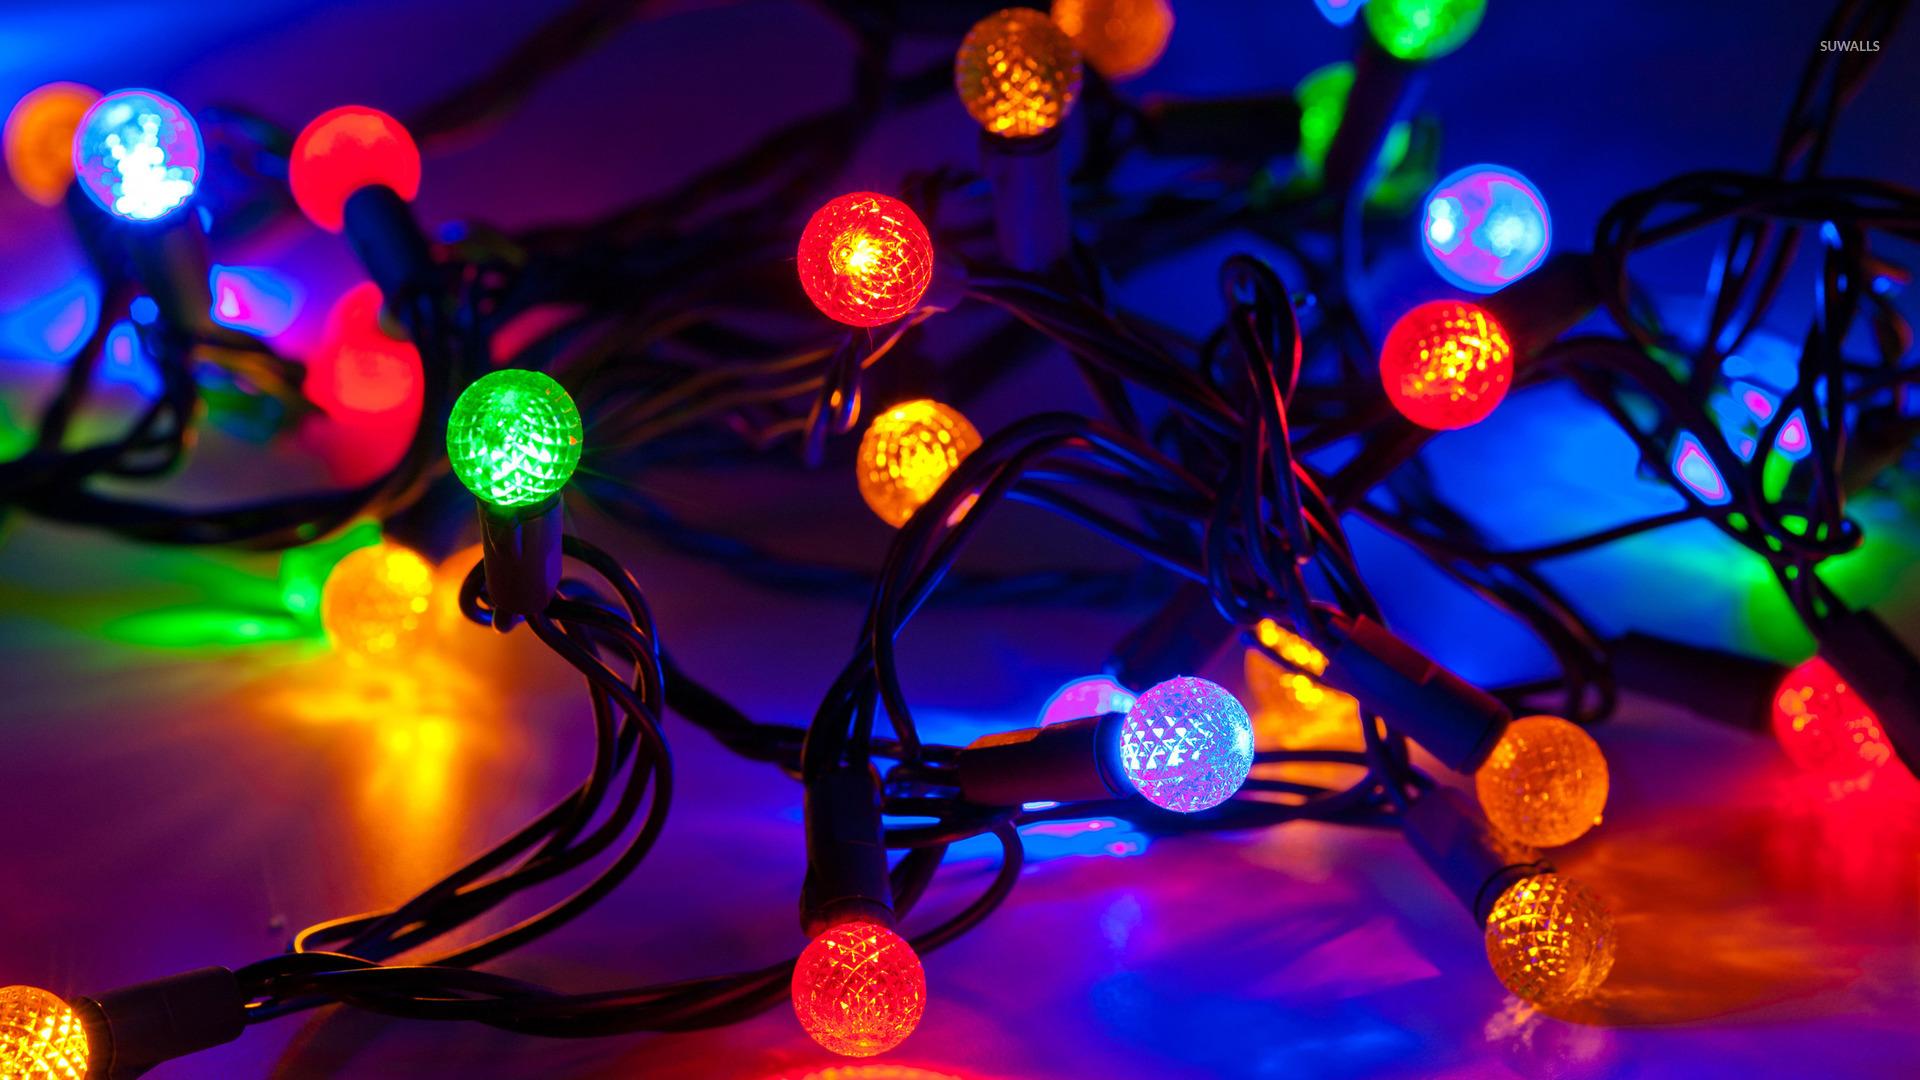 Christmas lights wallpaper   Photography wallpapers   22901 1920x1080